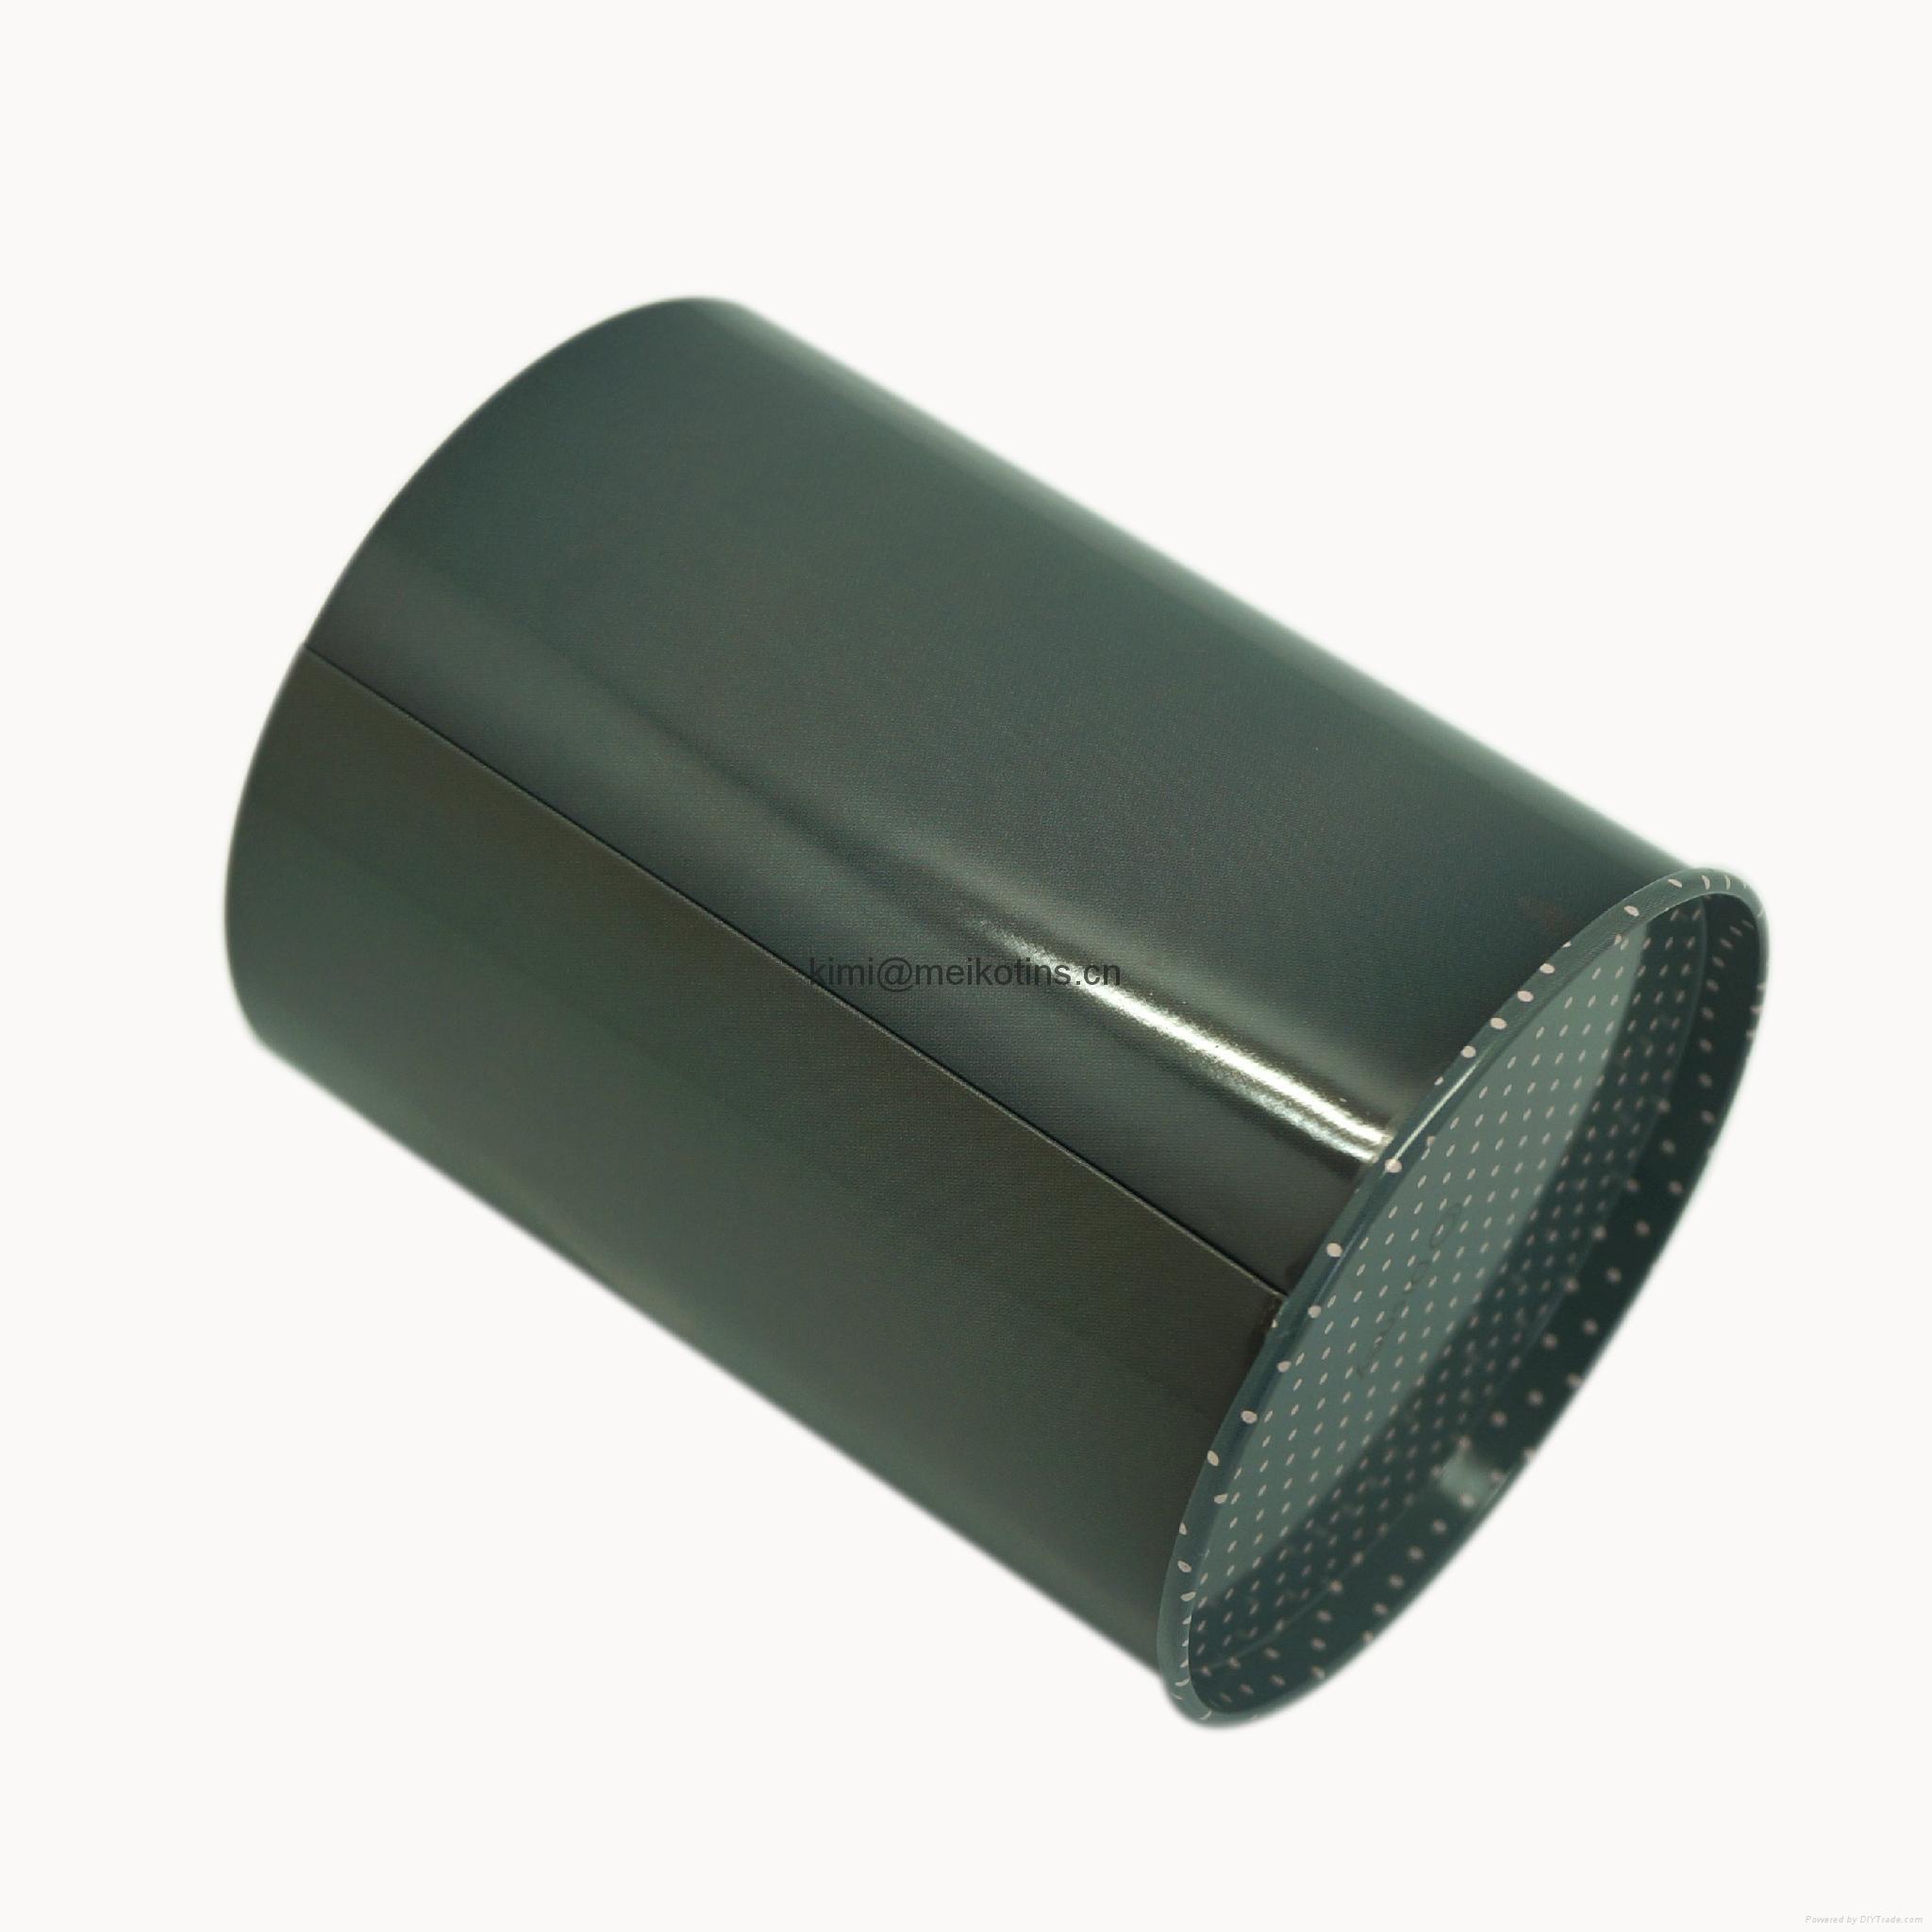 Round tin pencil holder 2